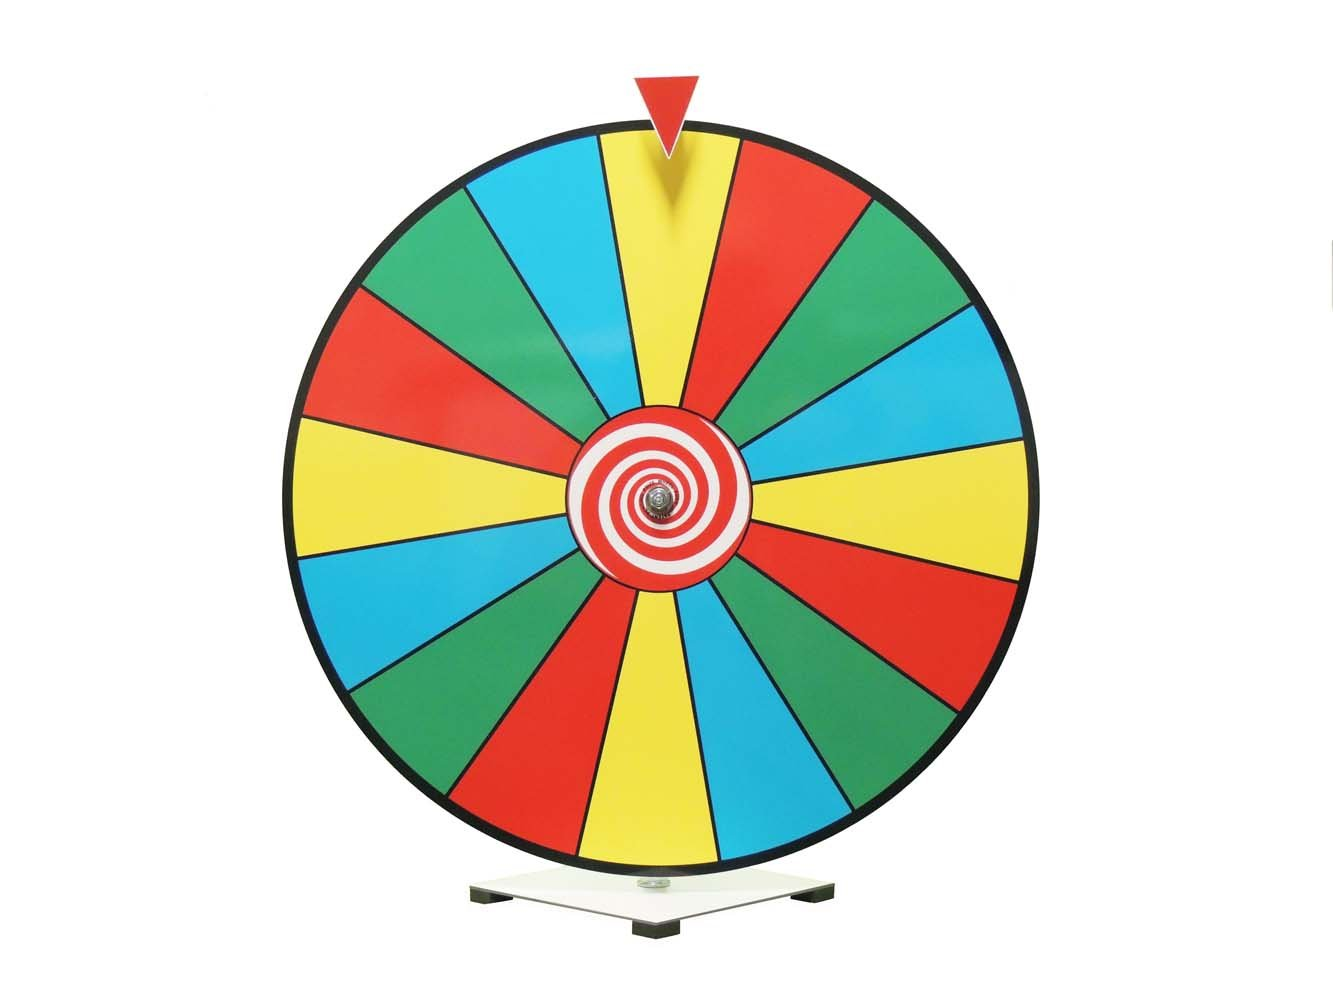 24 Inch Dry Erase Spinning Prize Wheel